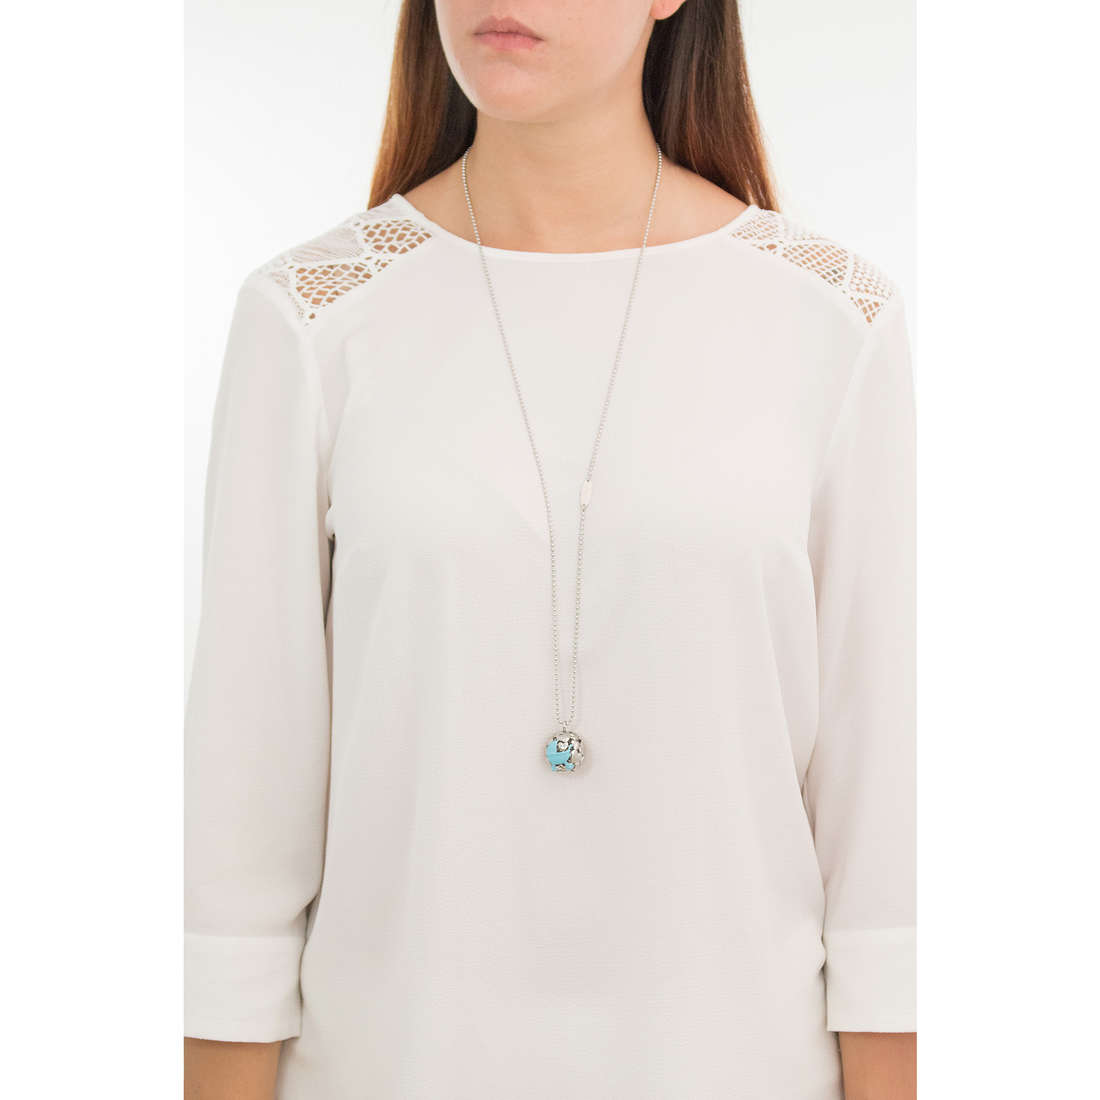 Luca Barra necklaces woman LBCK1066 indosso